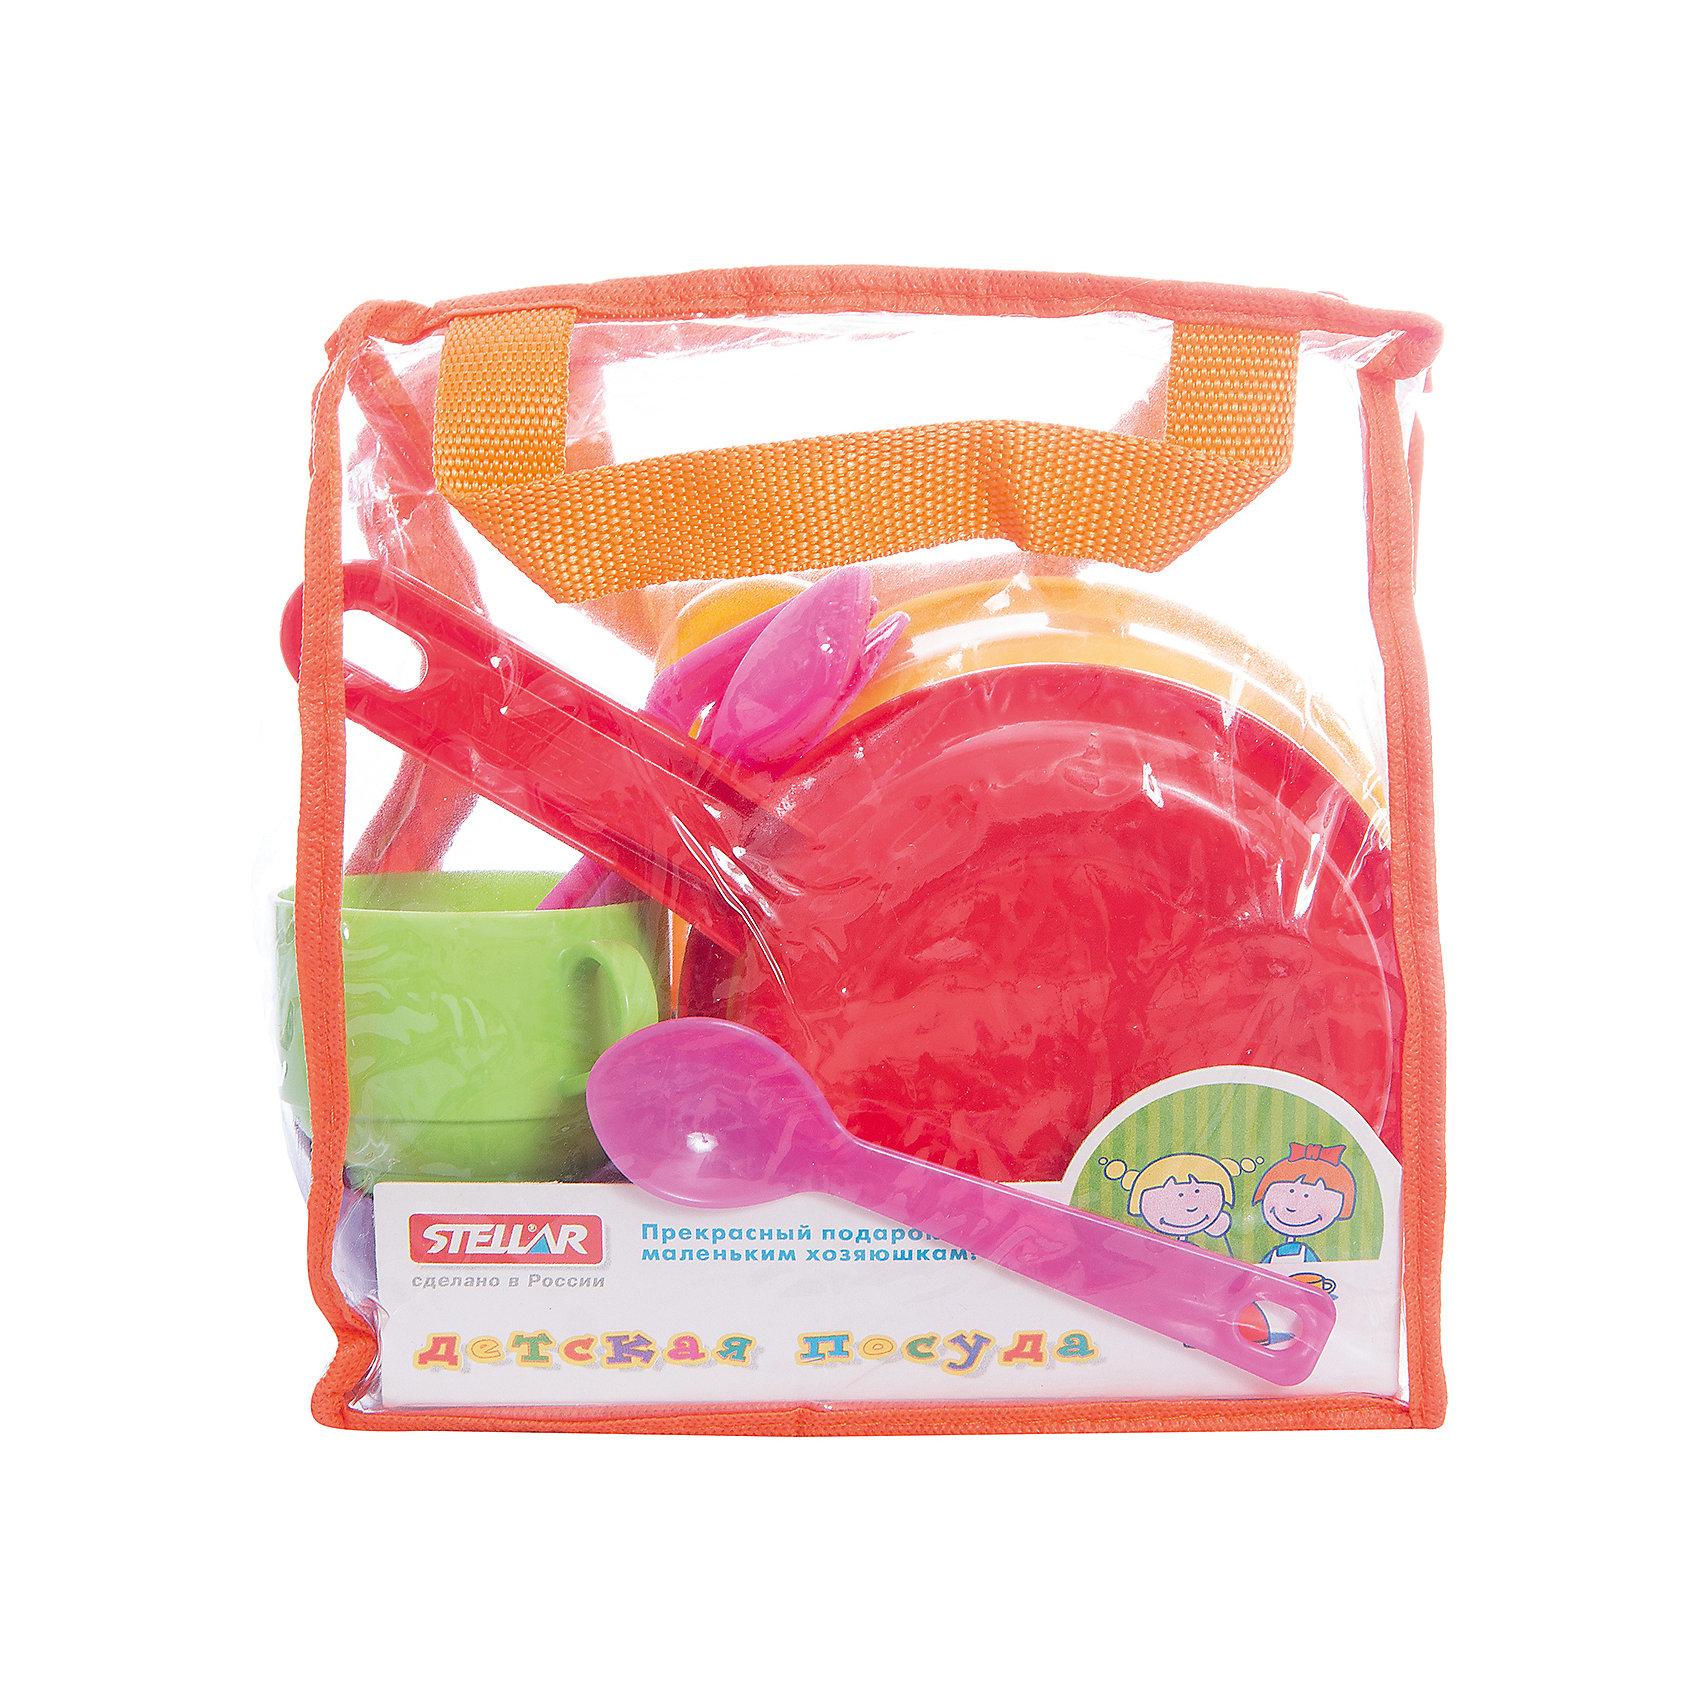 Стеллар Стеллар Посуда  детская набор  №2 стеллар погремушка дудочка стеллар